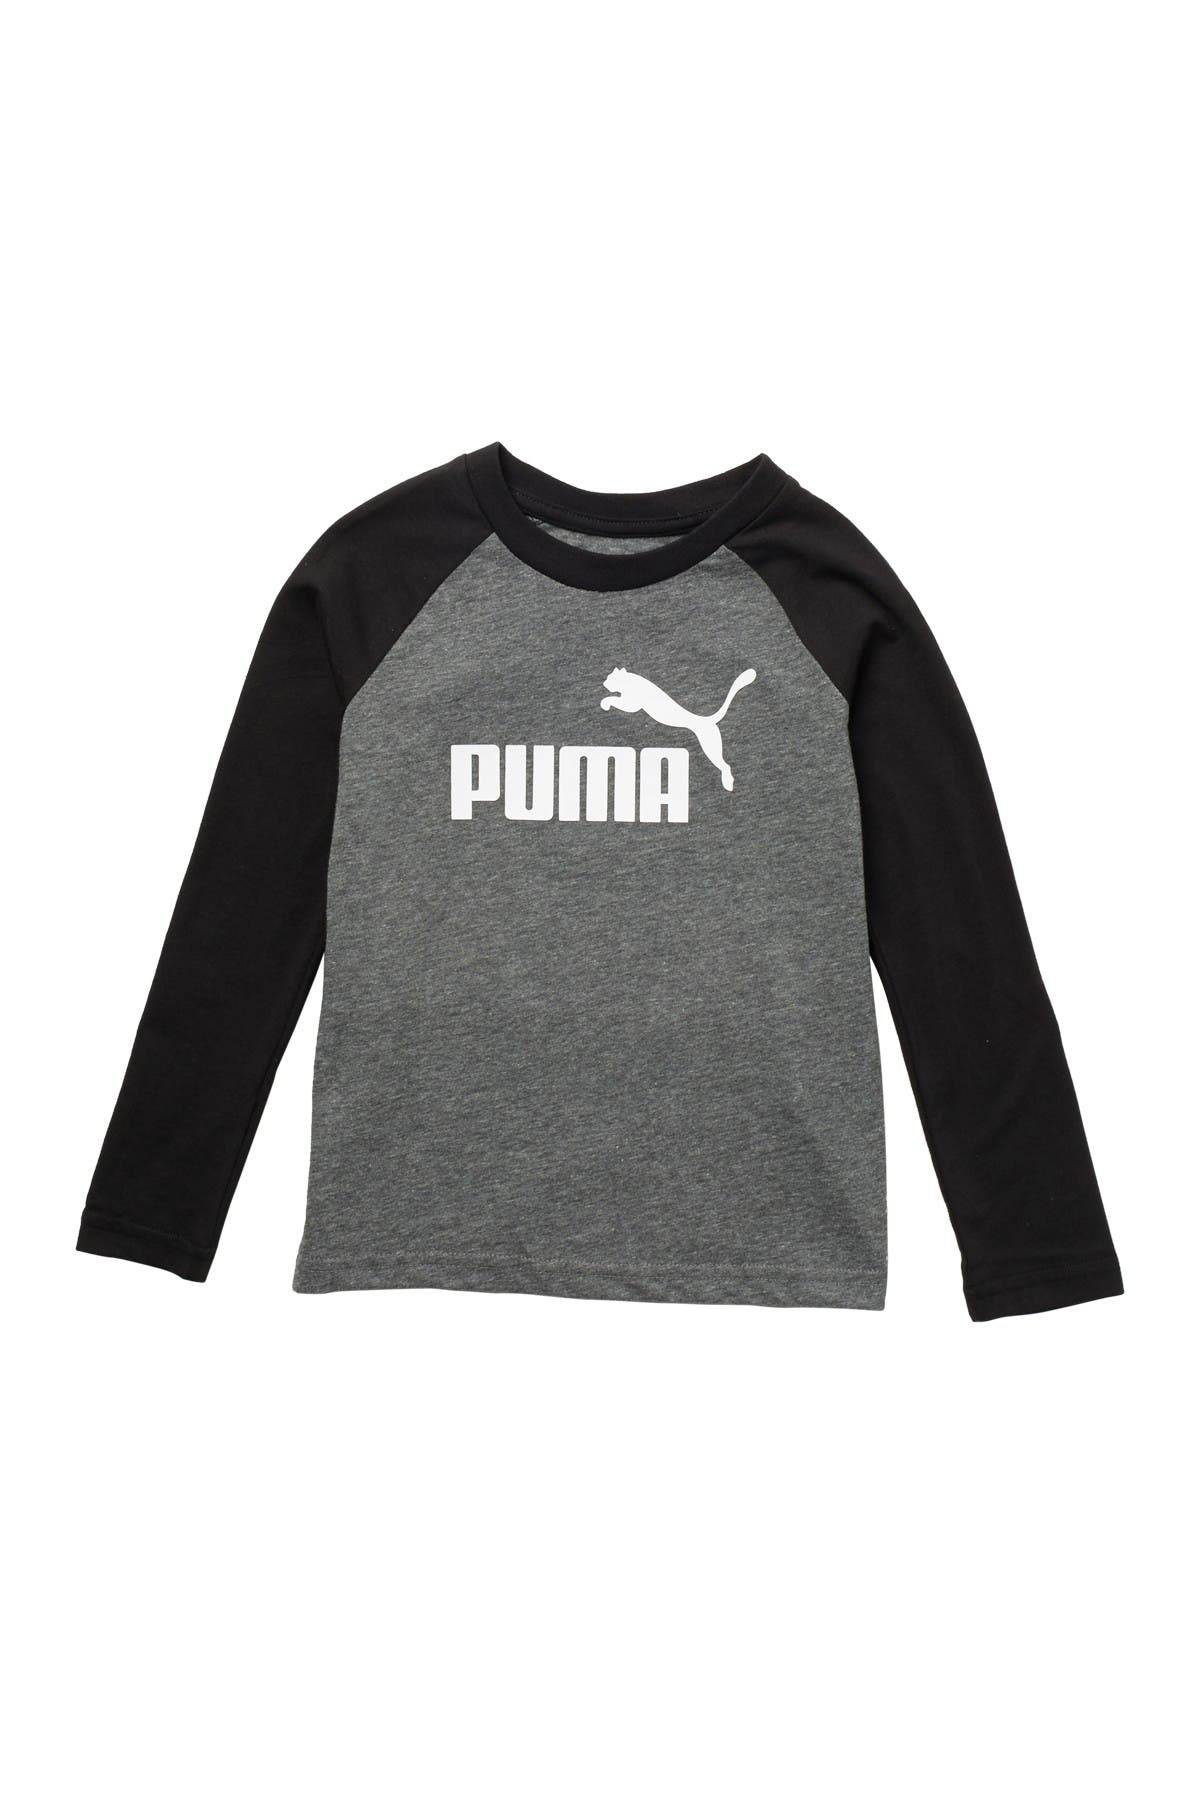 Image of PUMA No. 1 Logo Graphic Long Sleeve T-Shirt